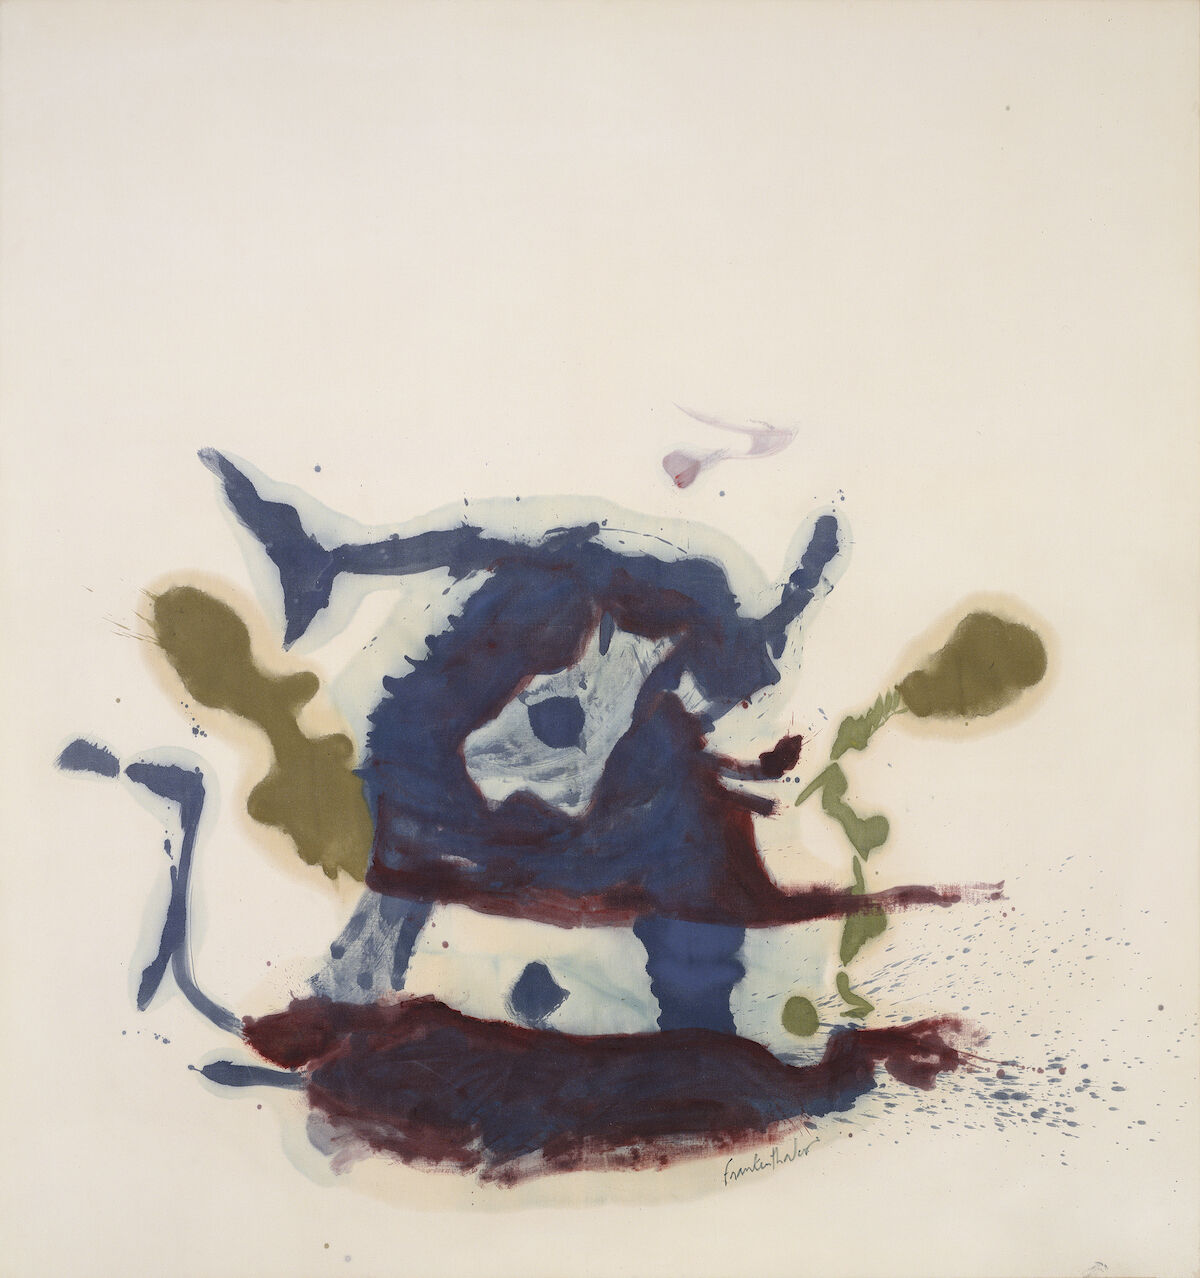 Helen Frankenthaler, Vessel, 1961. Oil on unsized, unprimed canvas. © 2019 Helen Frankenthaler Foundation, Inc. / Artists Rights Society (ARS), New York. Photo: Jordan Tinker, courtesy Helen Frankenthaler Foundation.